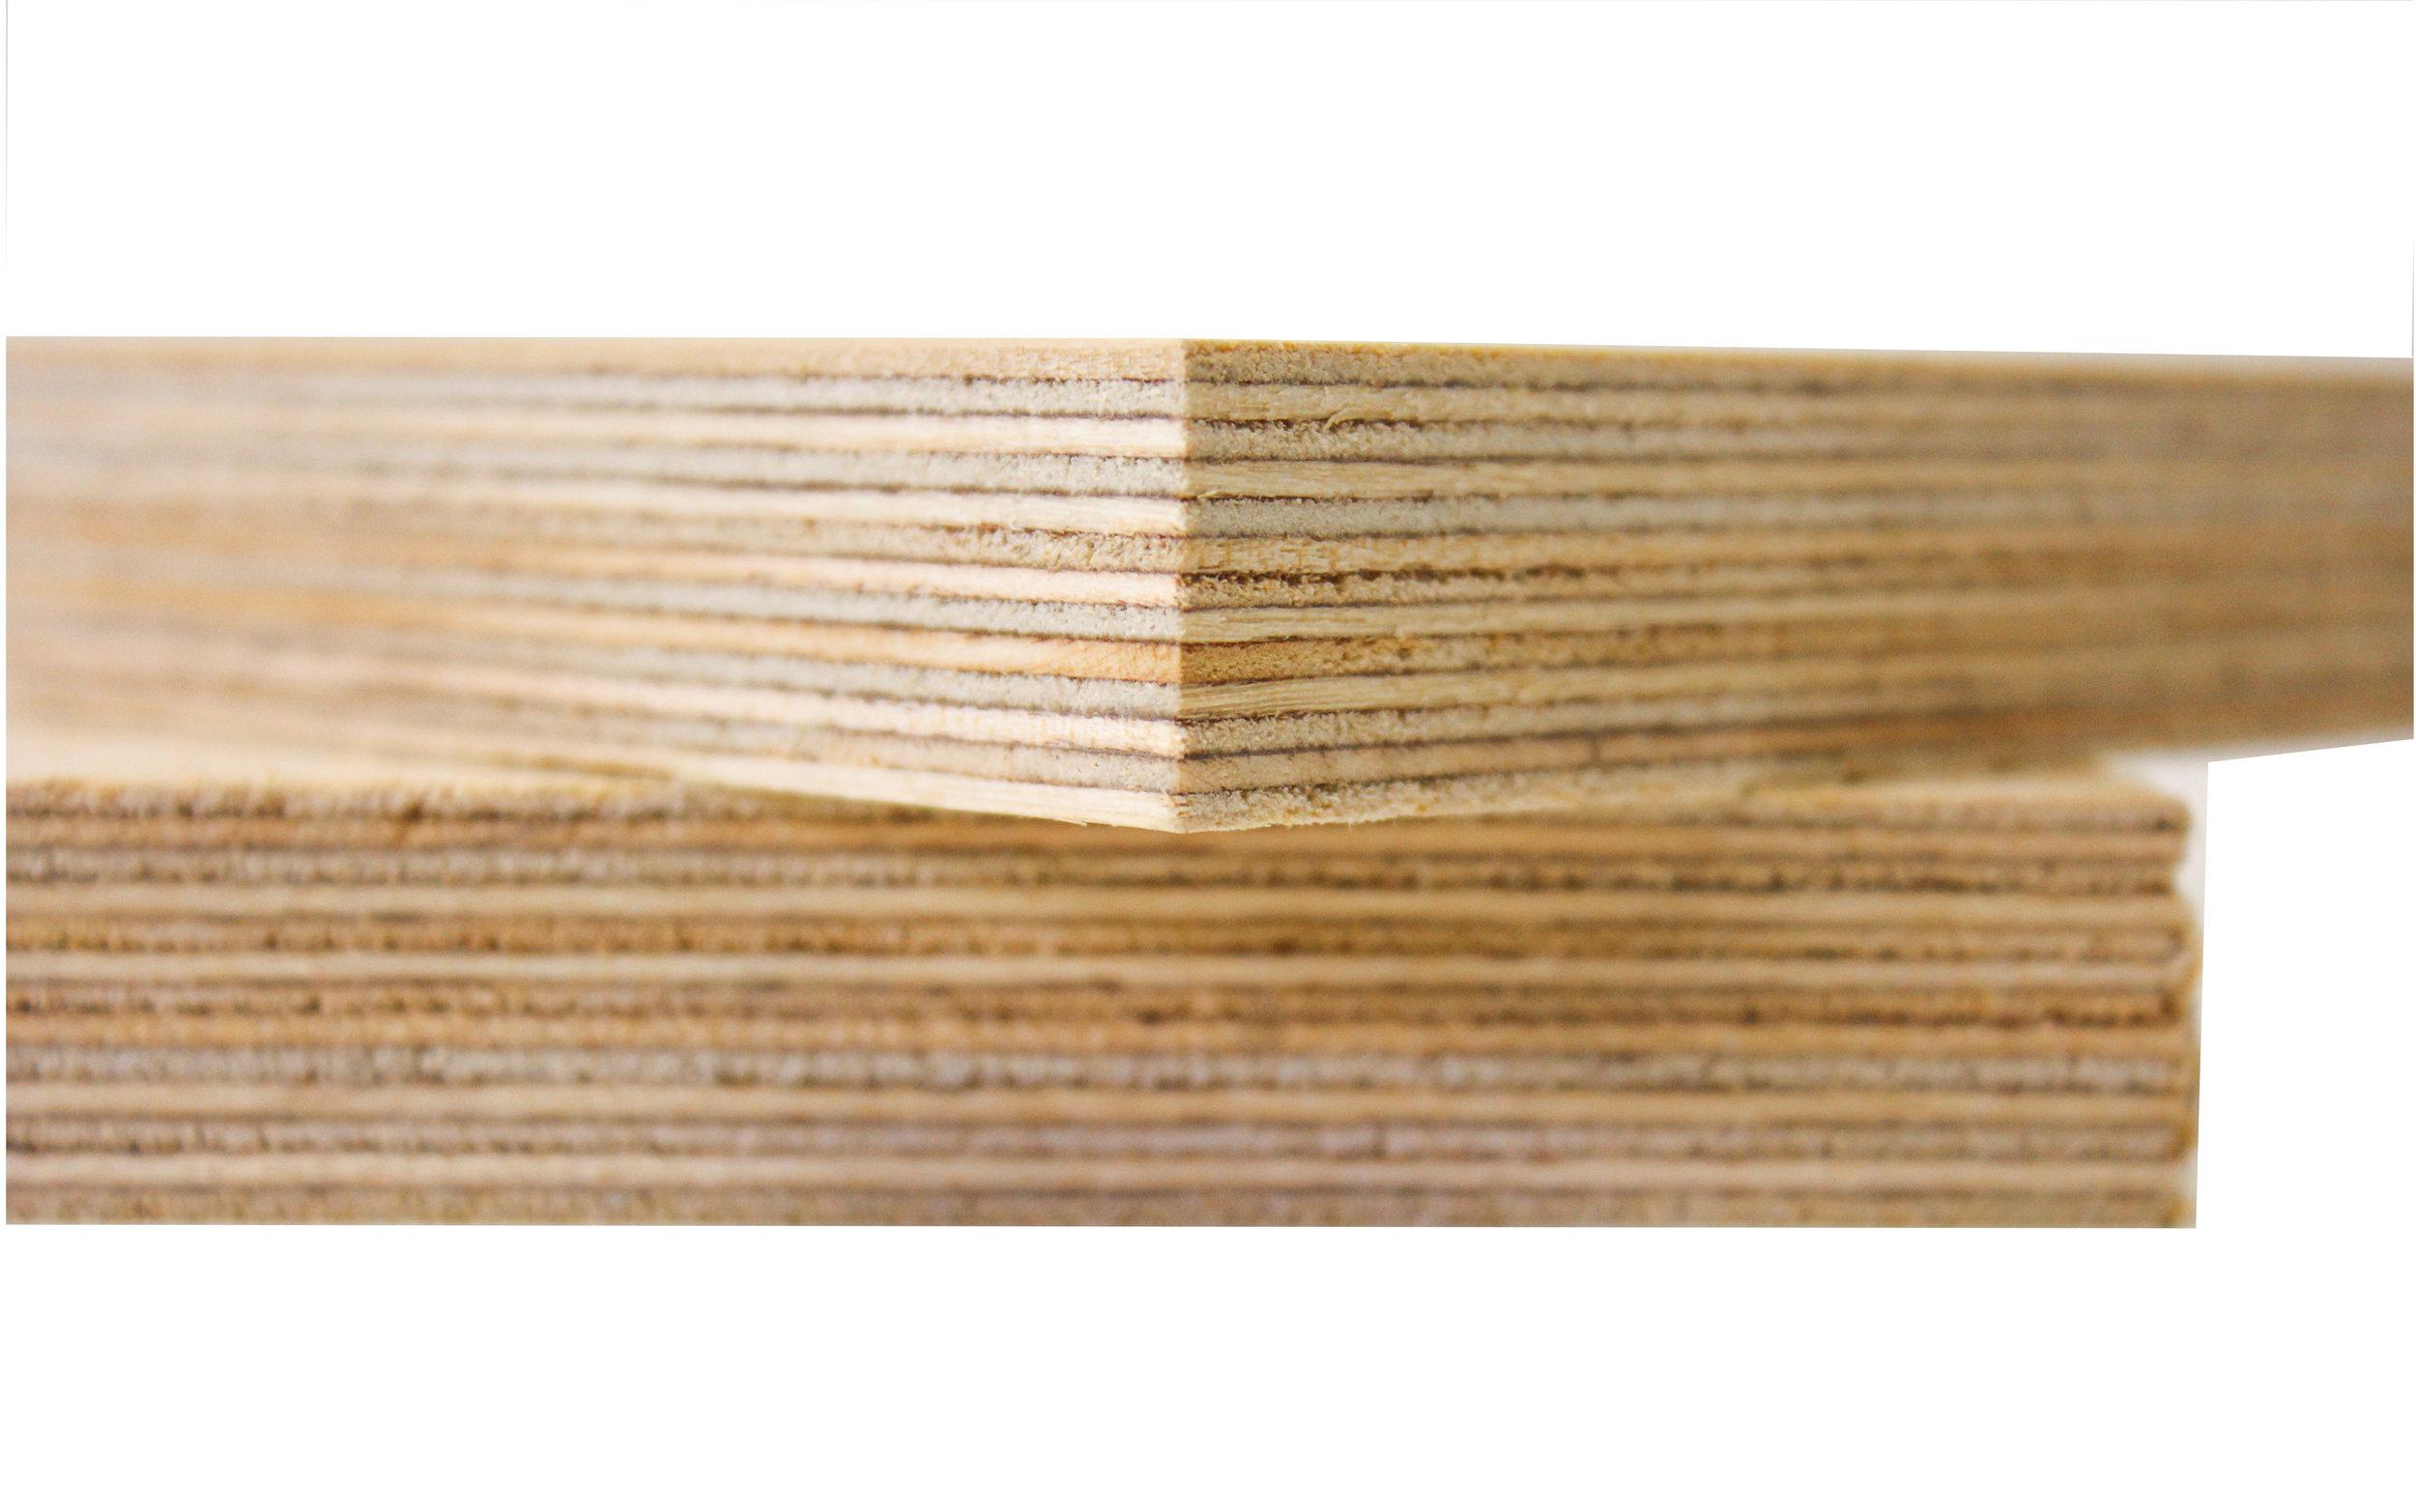 biech plywood2.jpg